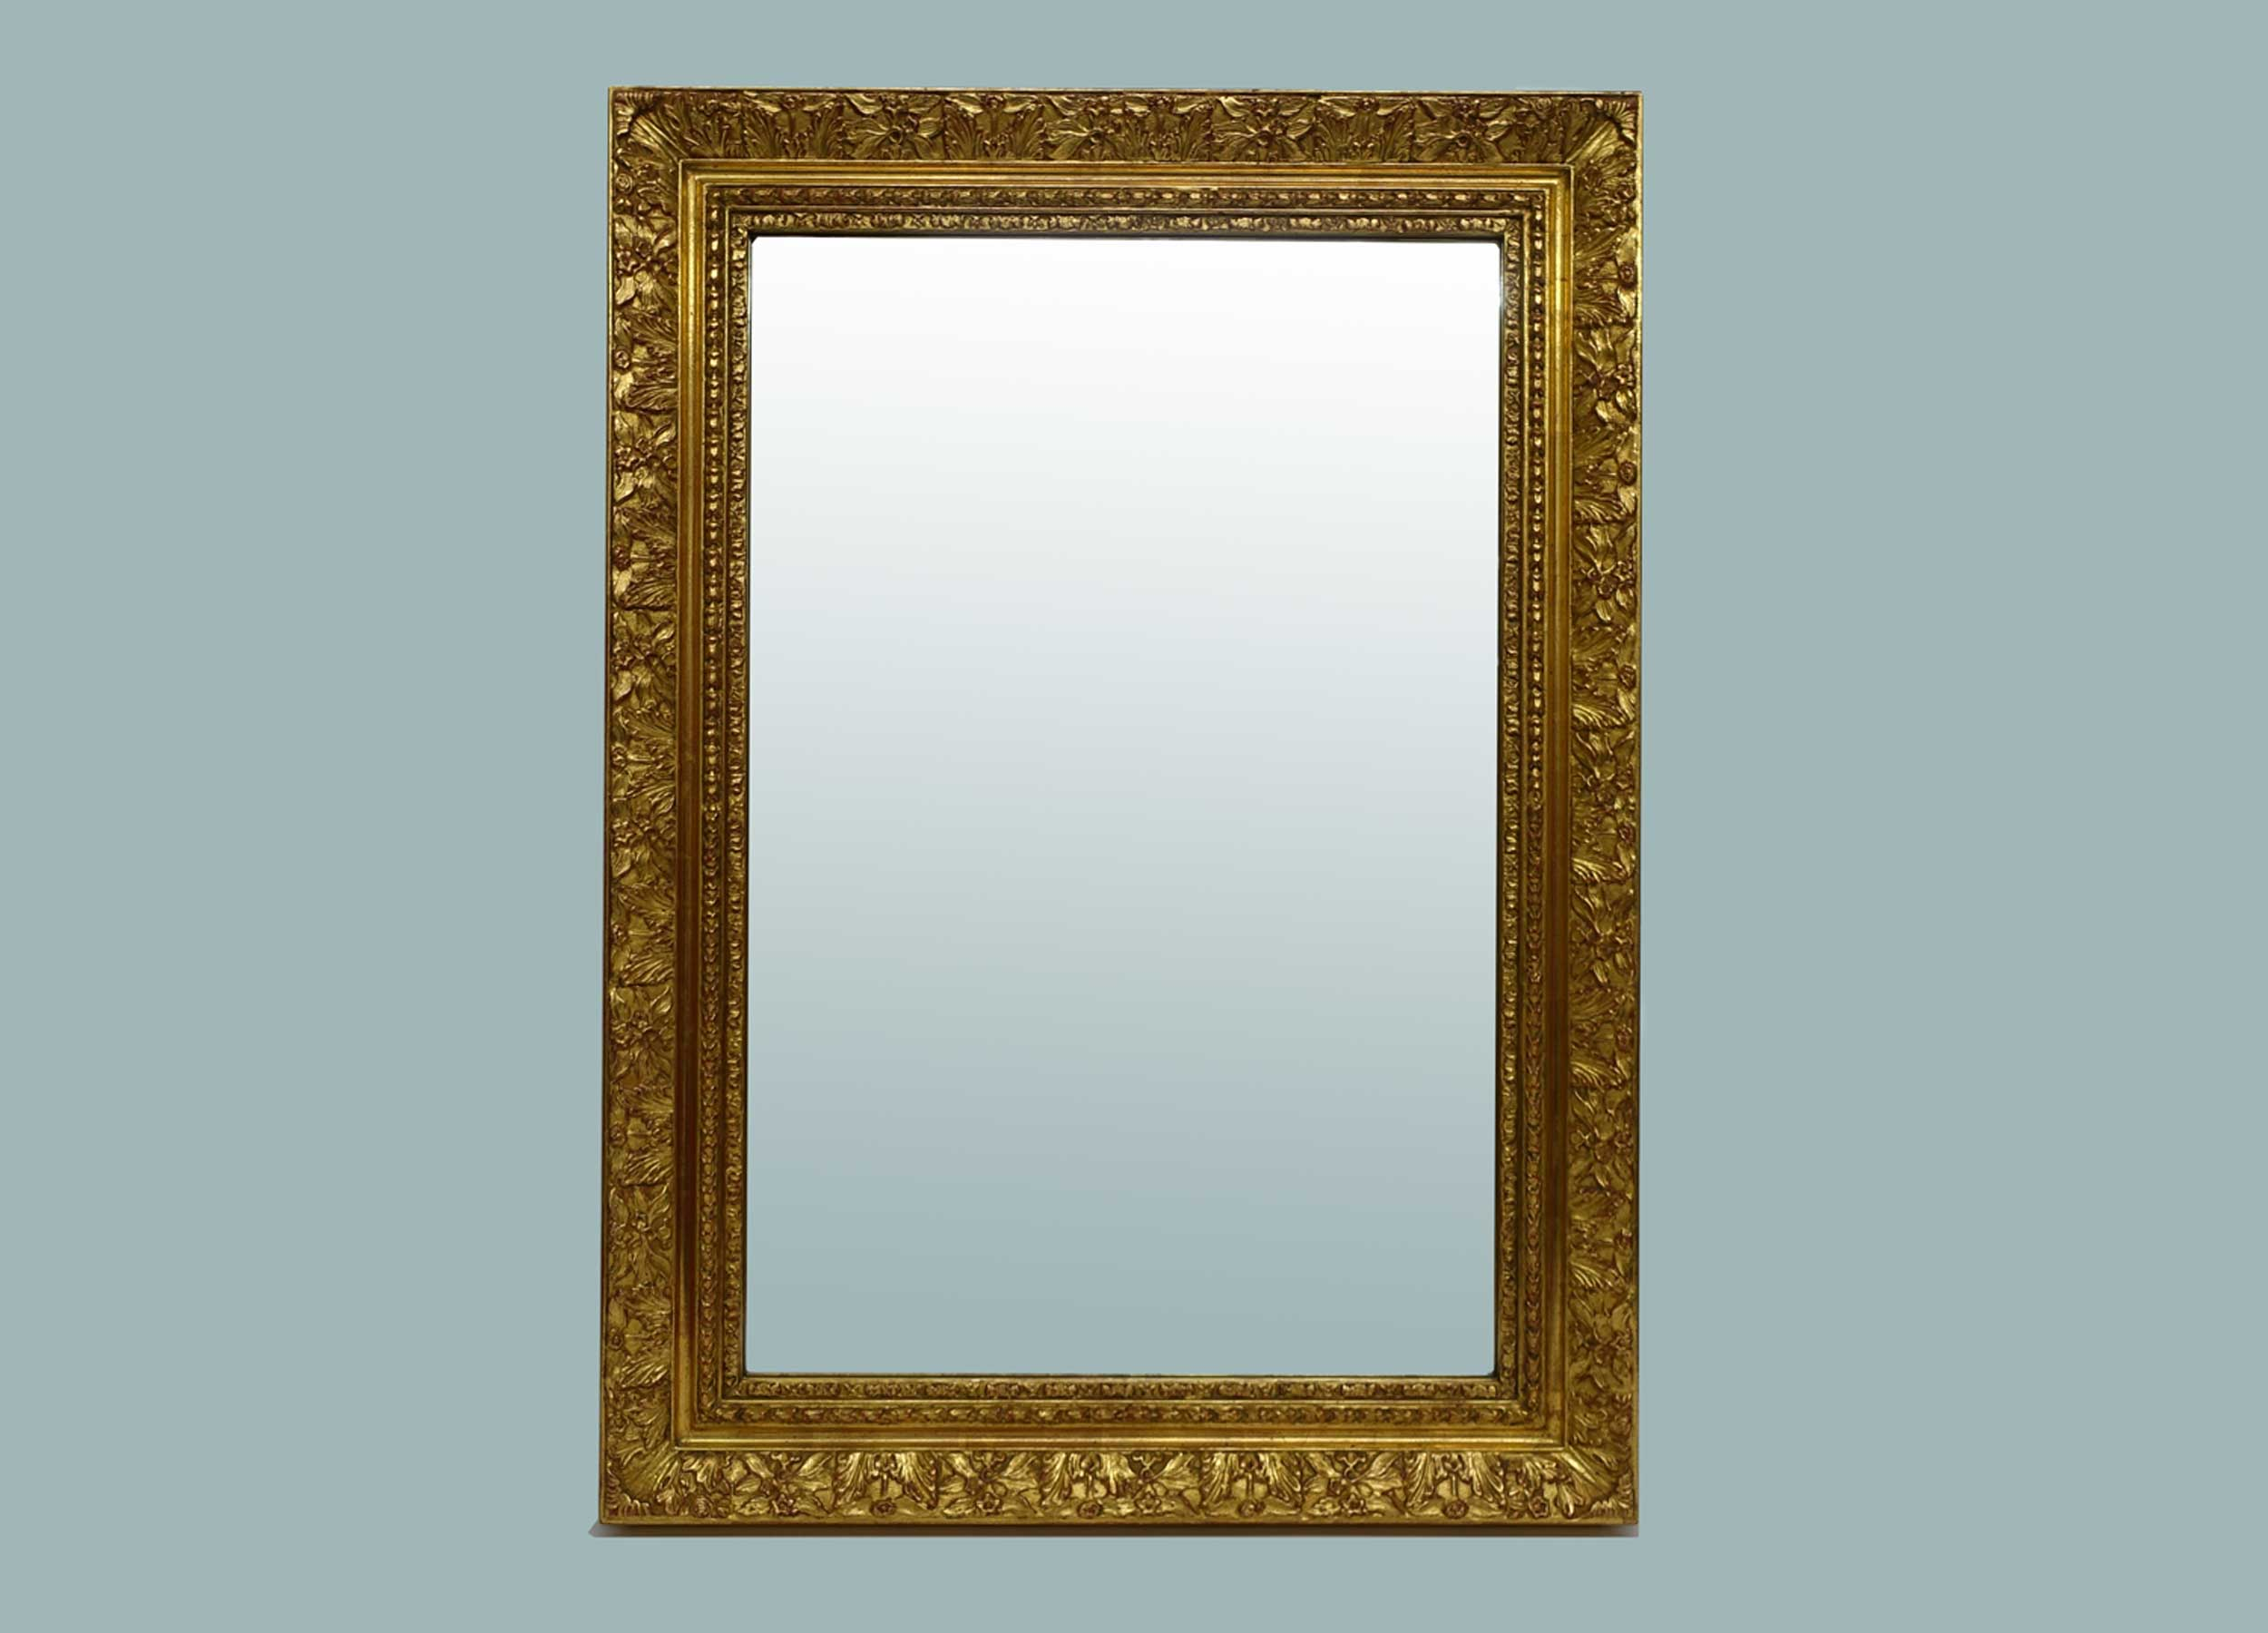 Web_mirror1_2500x1800-Recovered.jpg